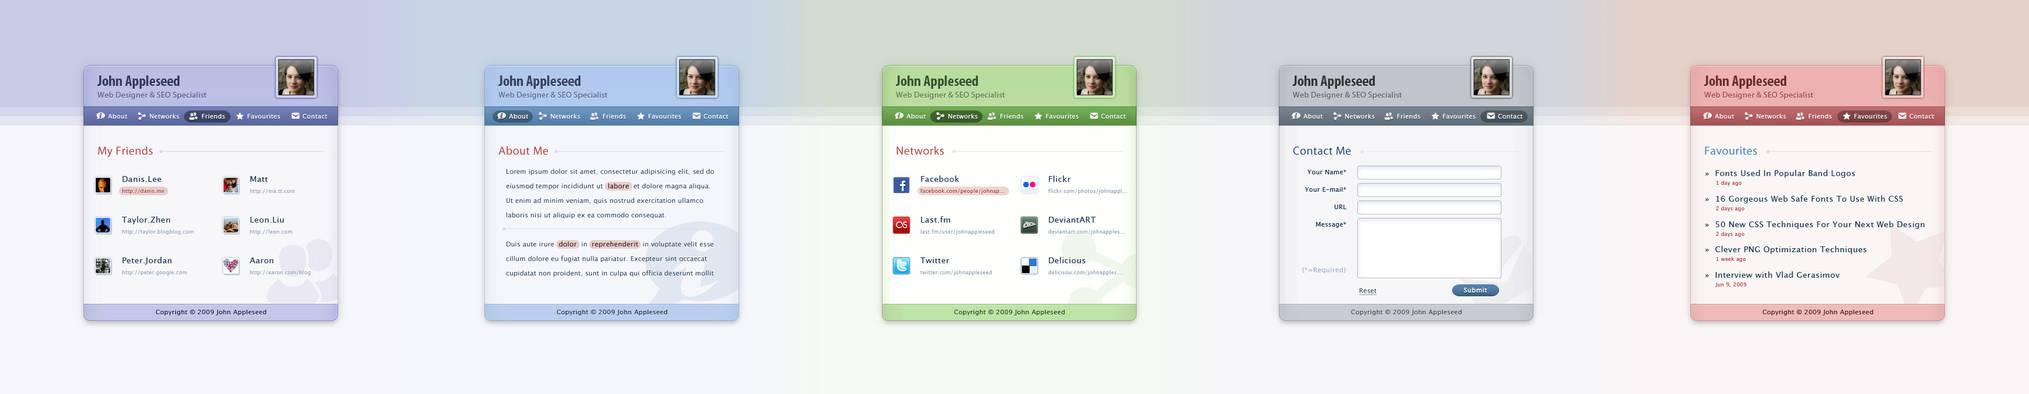 ID Page Web Design